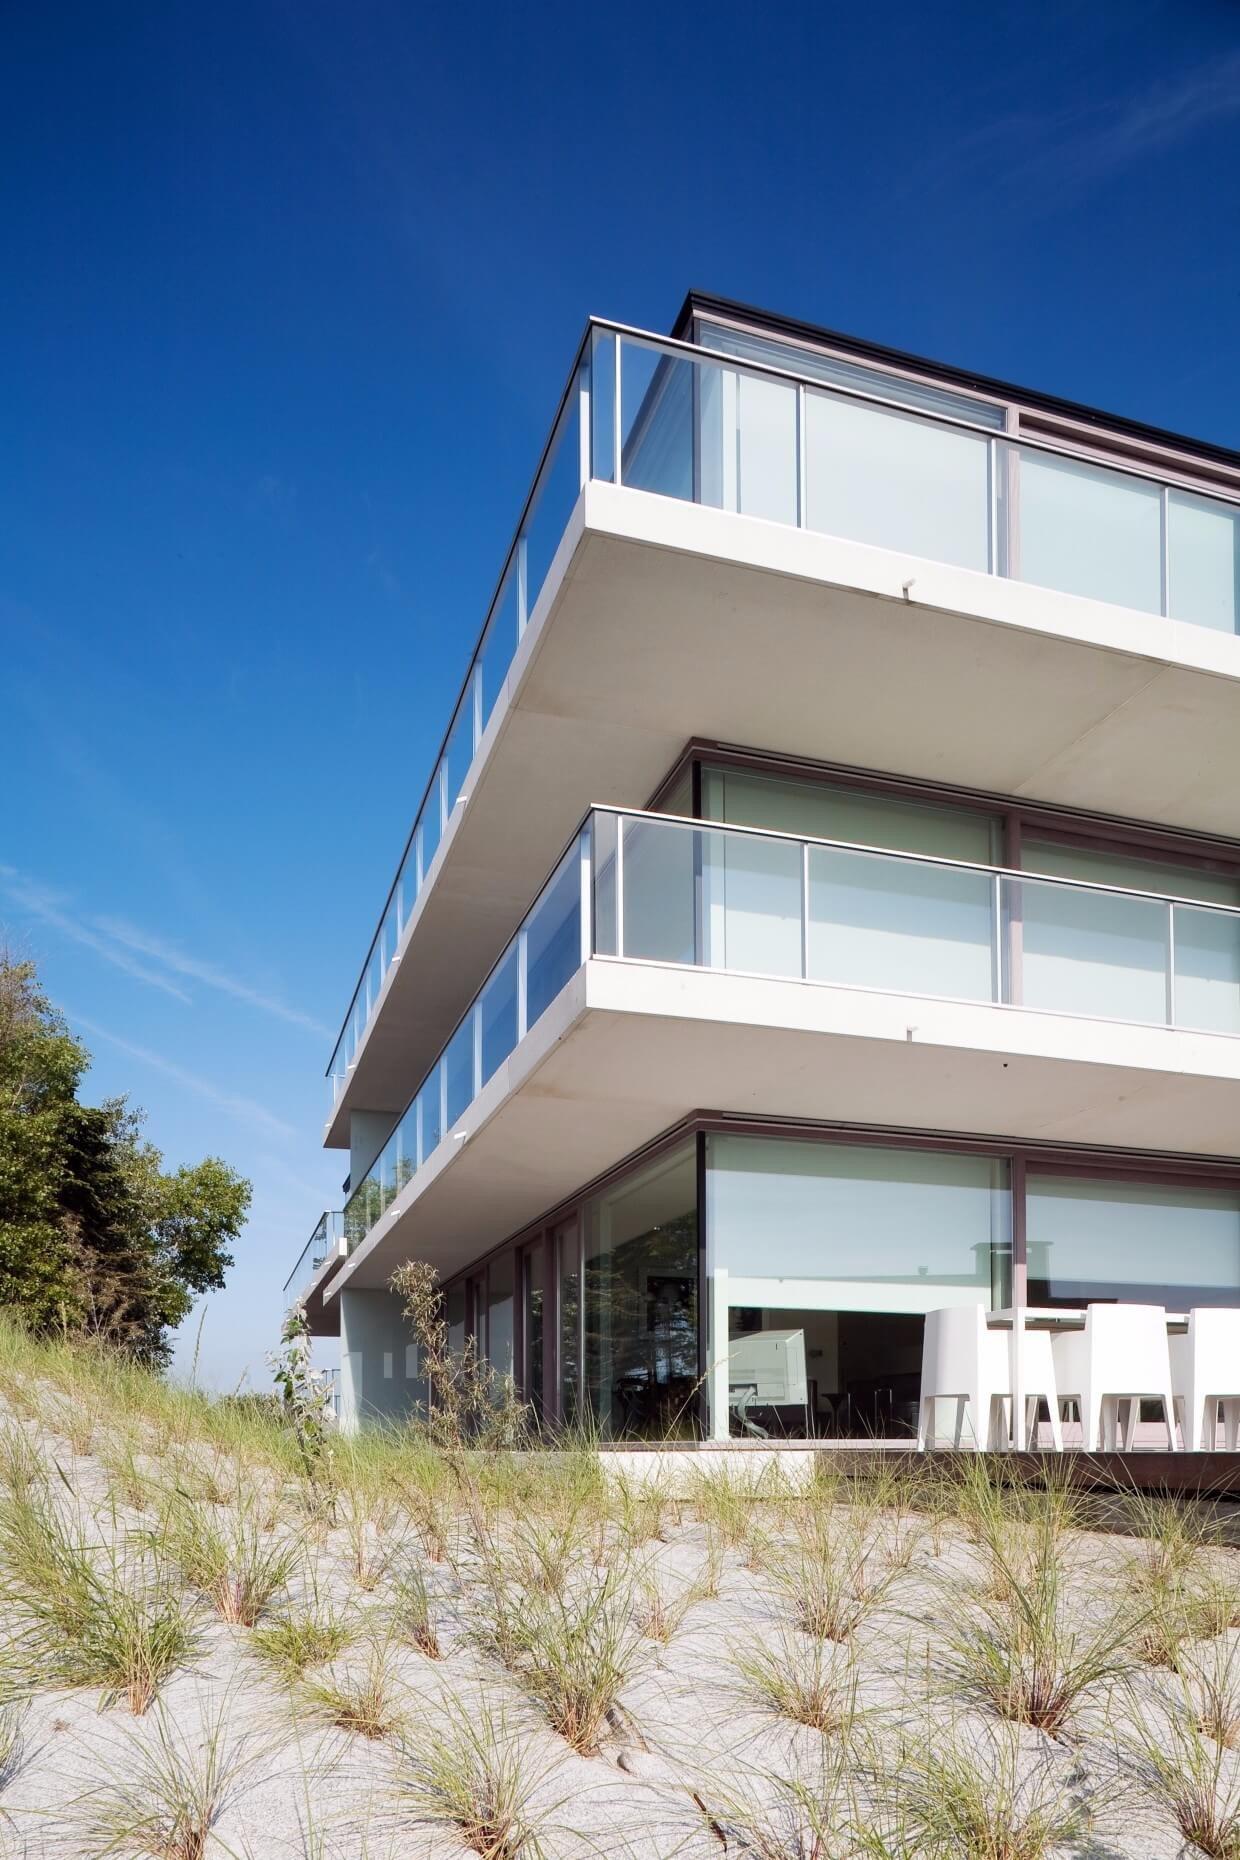 Rietveldprojects-Periscoop-appartement-design-architectuur-kust17